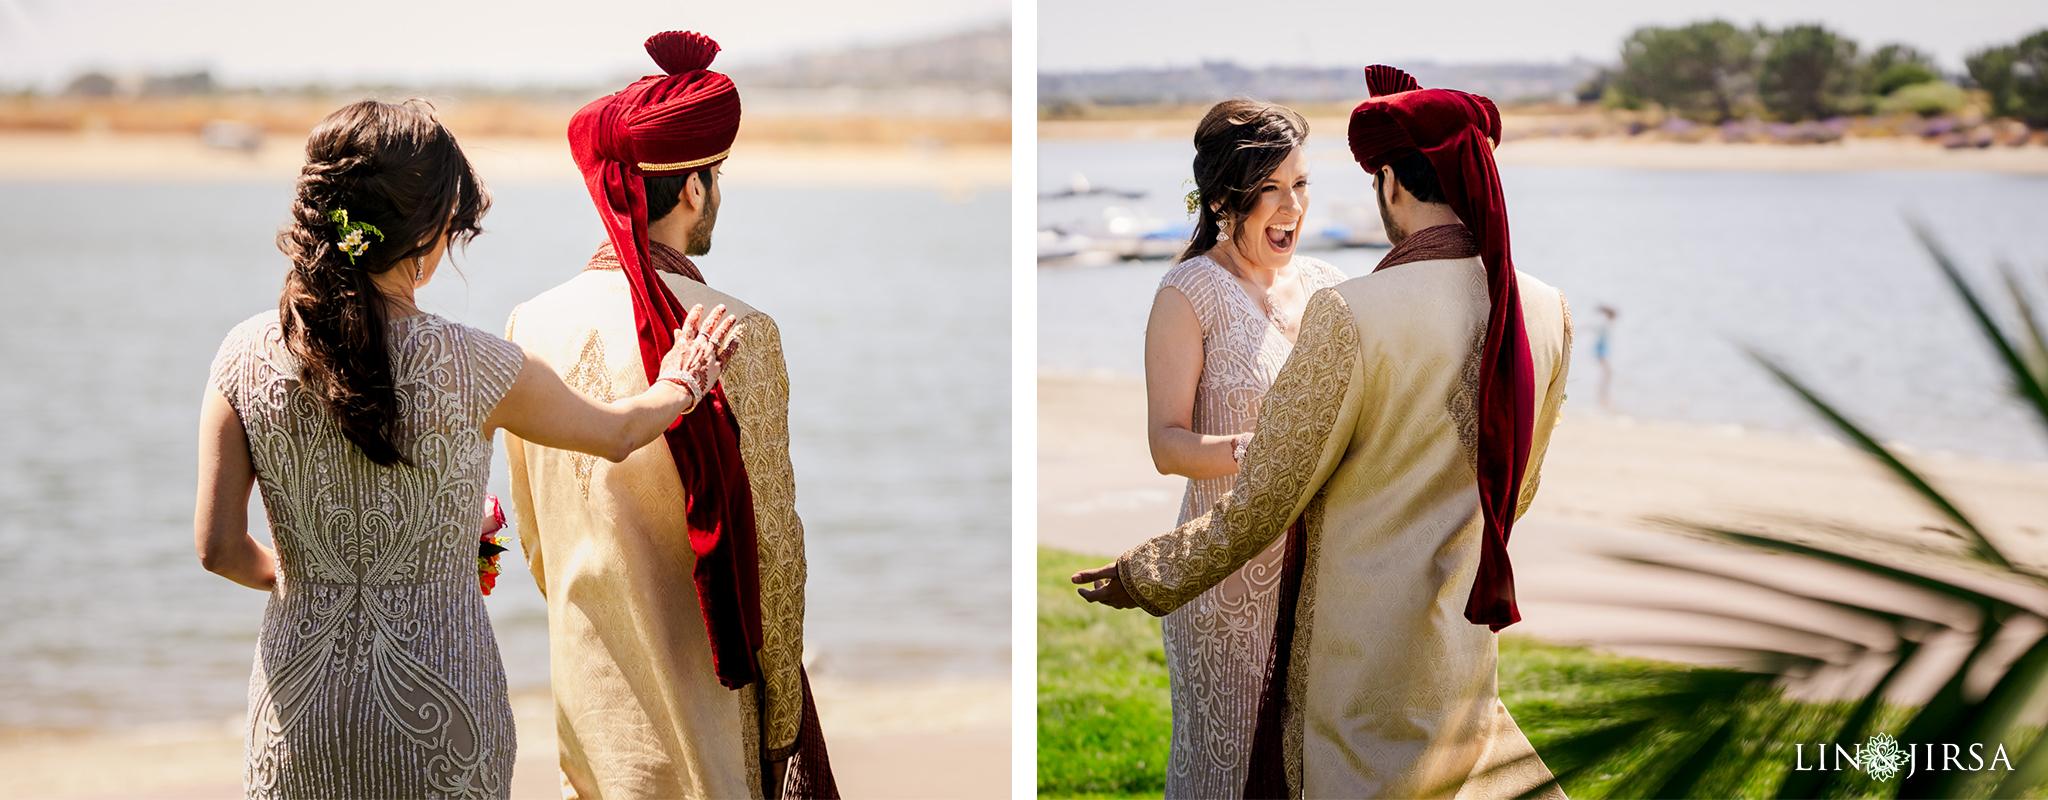 09 Hilton Mission Bay San Diego South Asian Wedding Photography